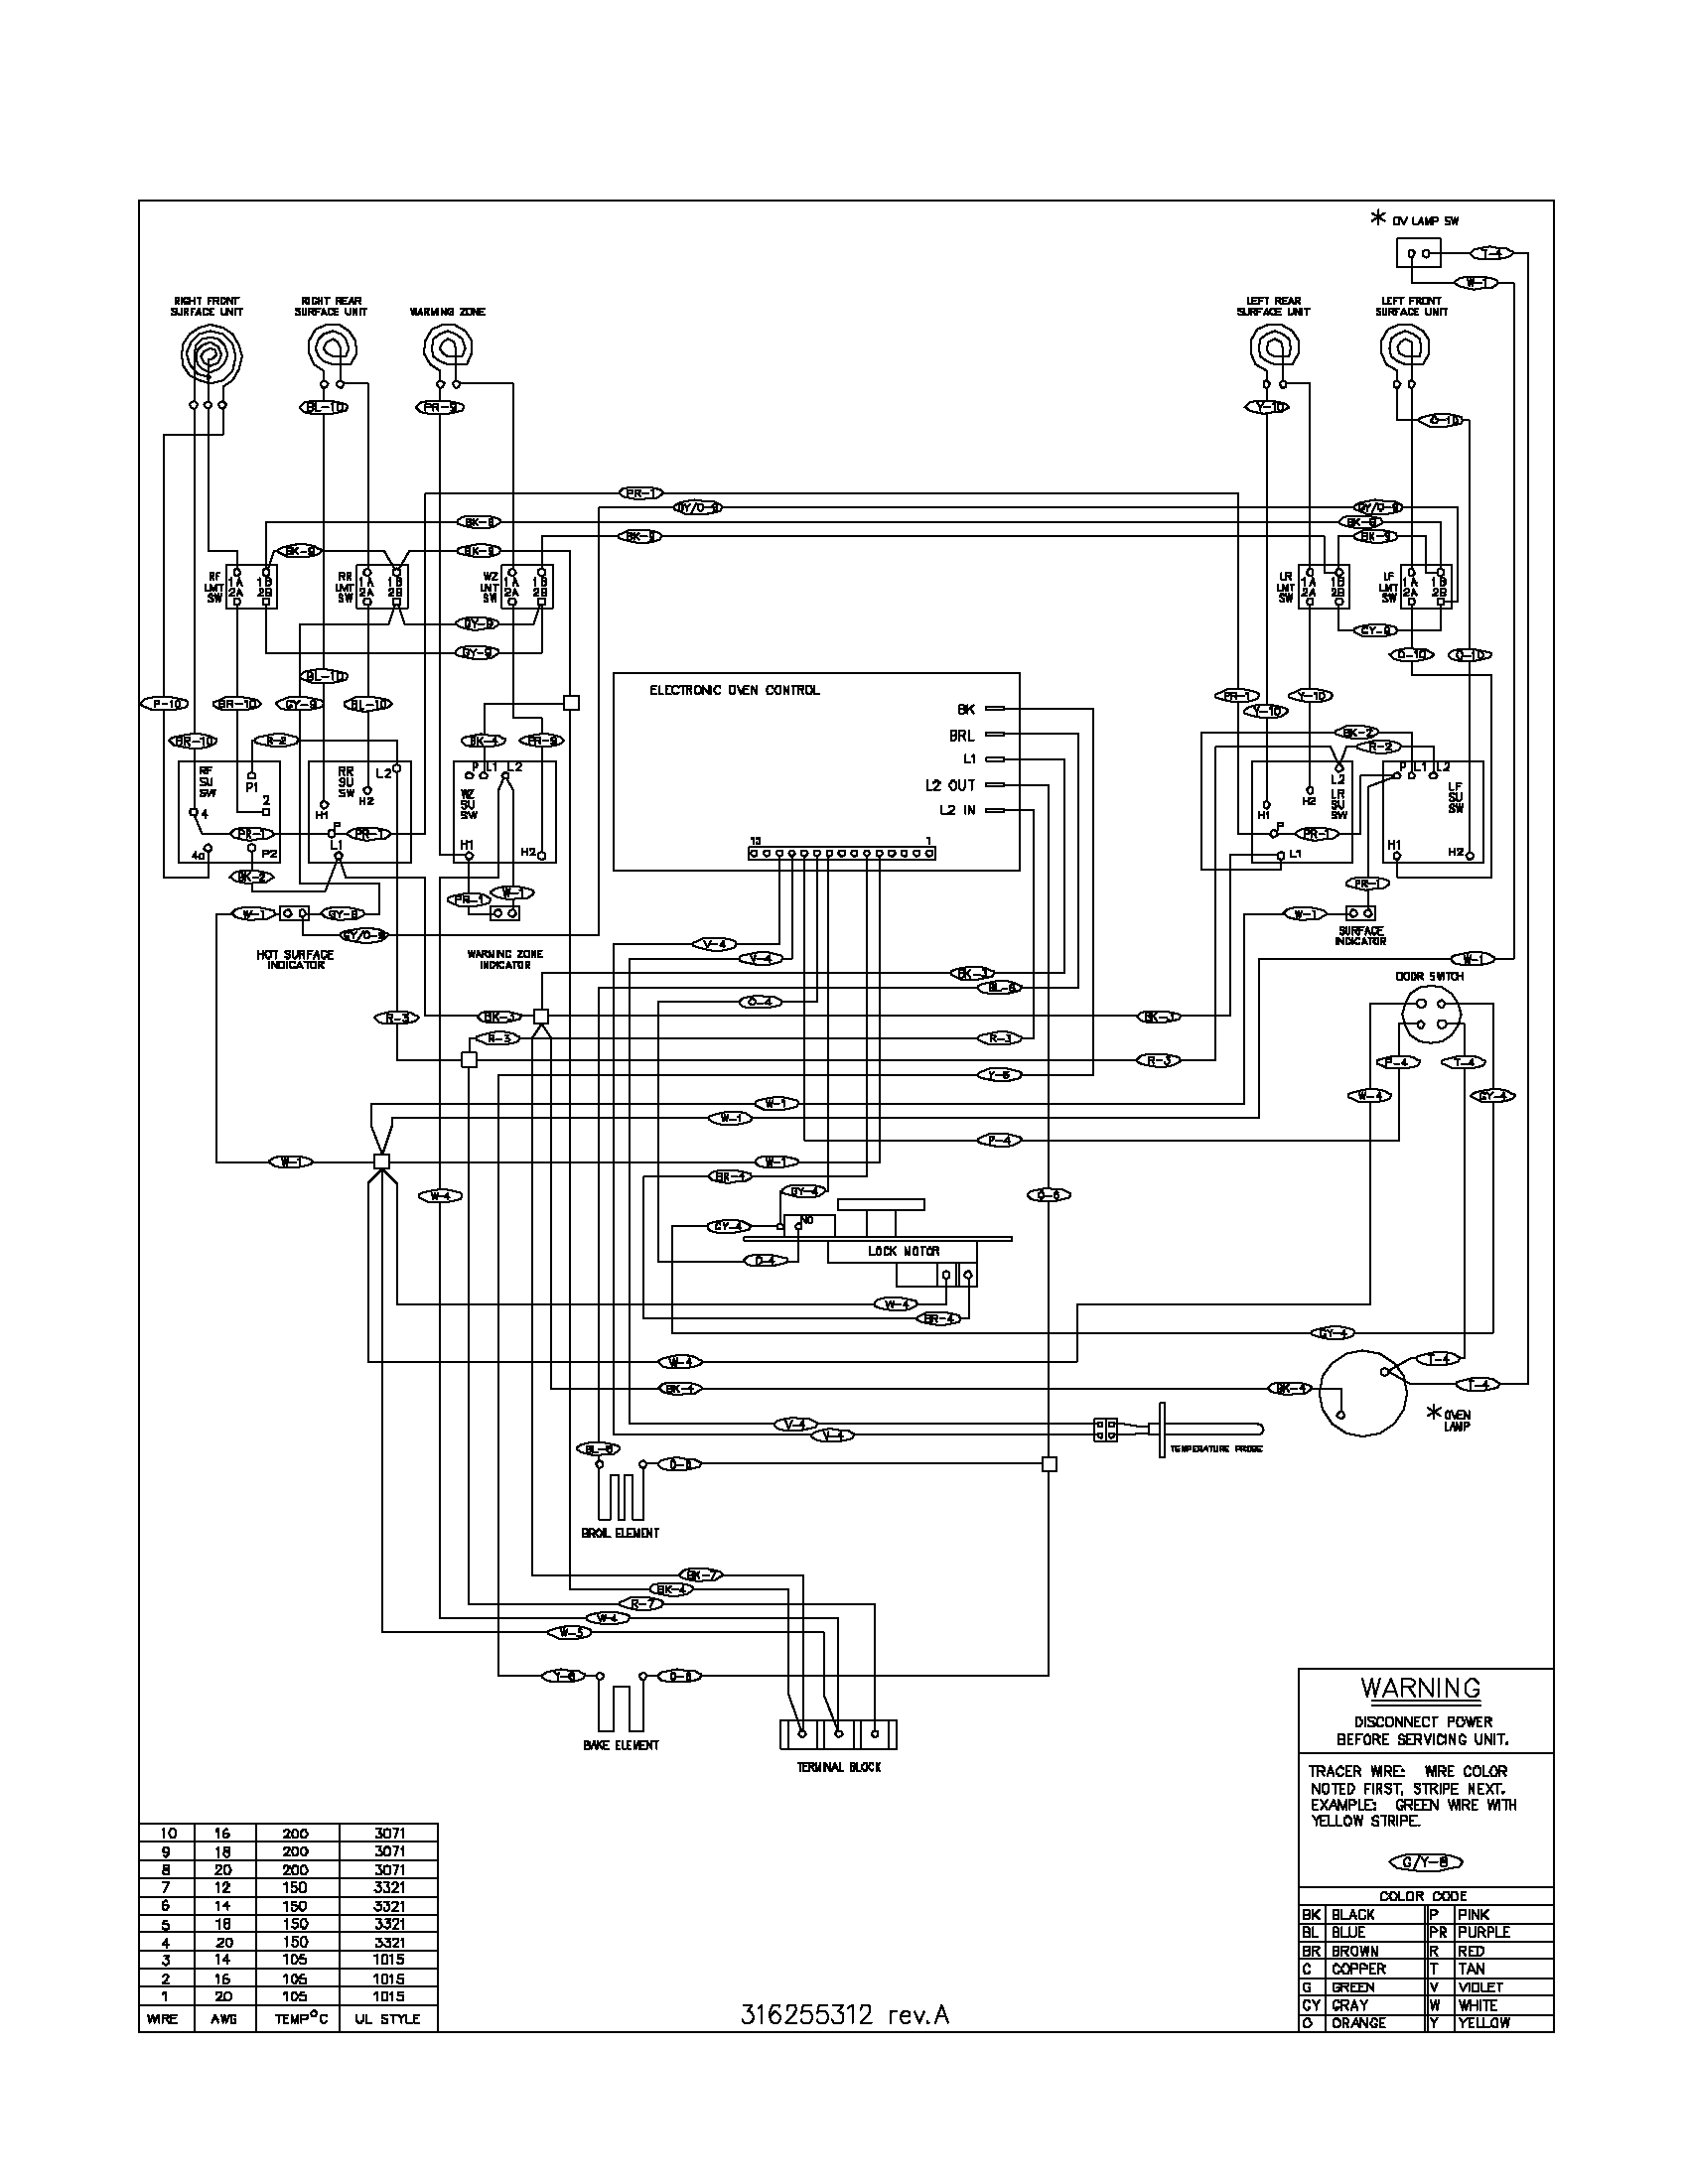 TM_5854] Wiring Diagram For Frigidaire Oven Get Free Image About WiringPneu Seve Phae Mohammedshrine Librar Wiring 101